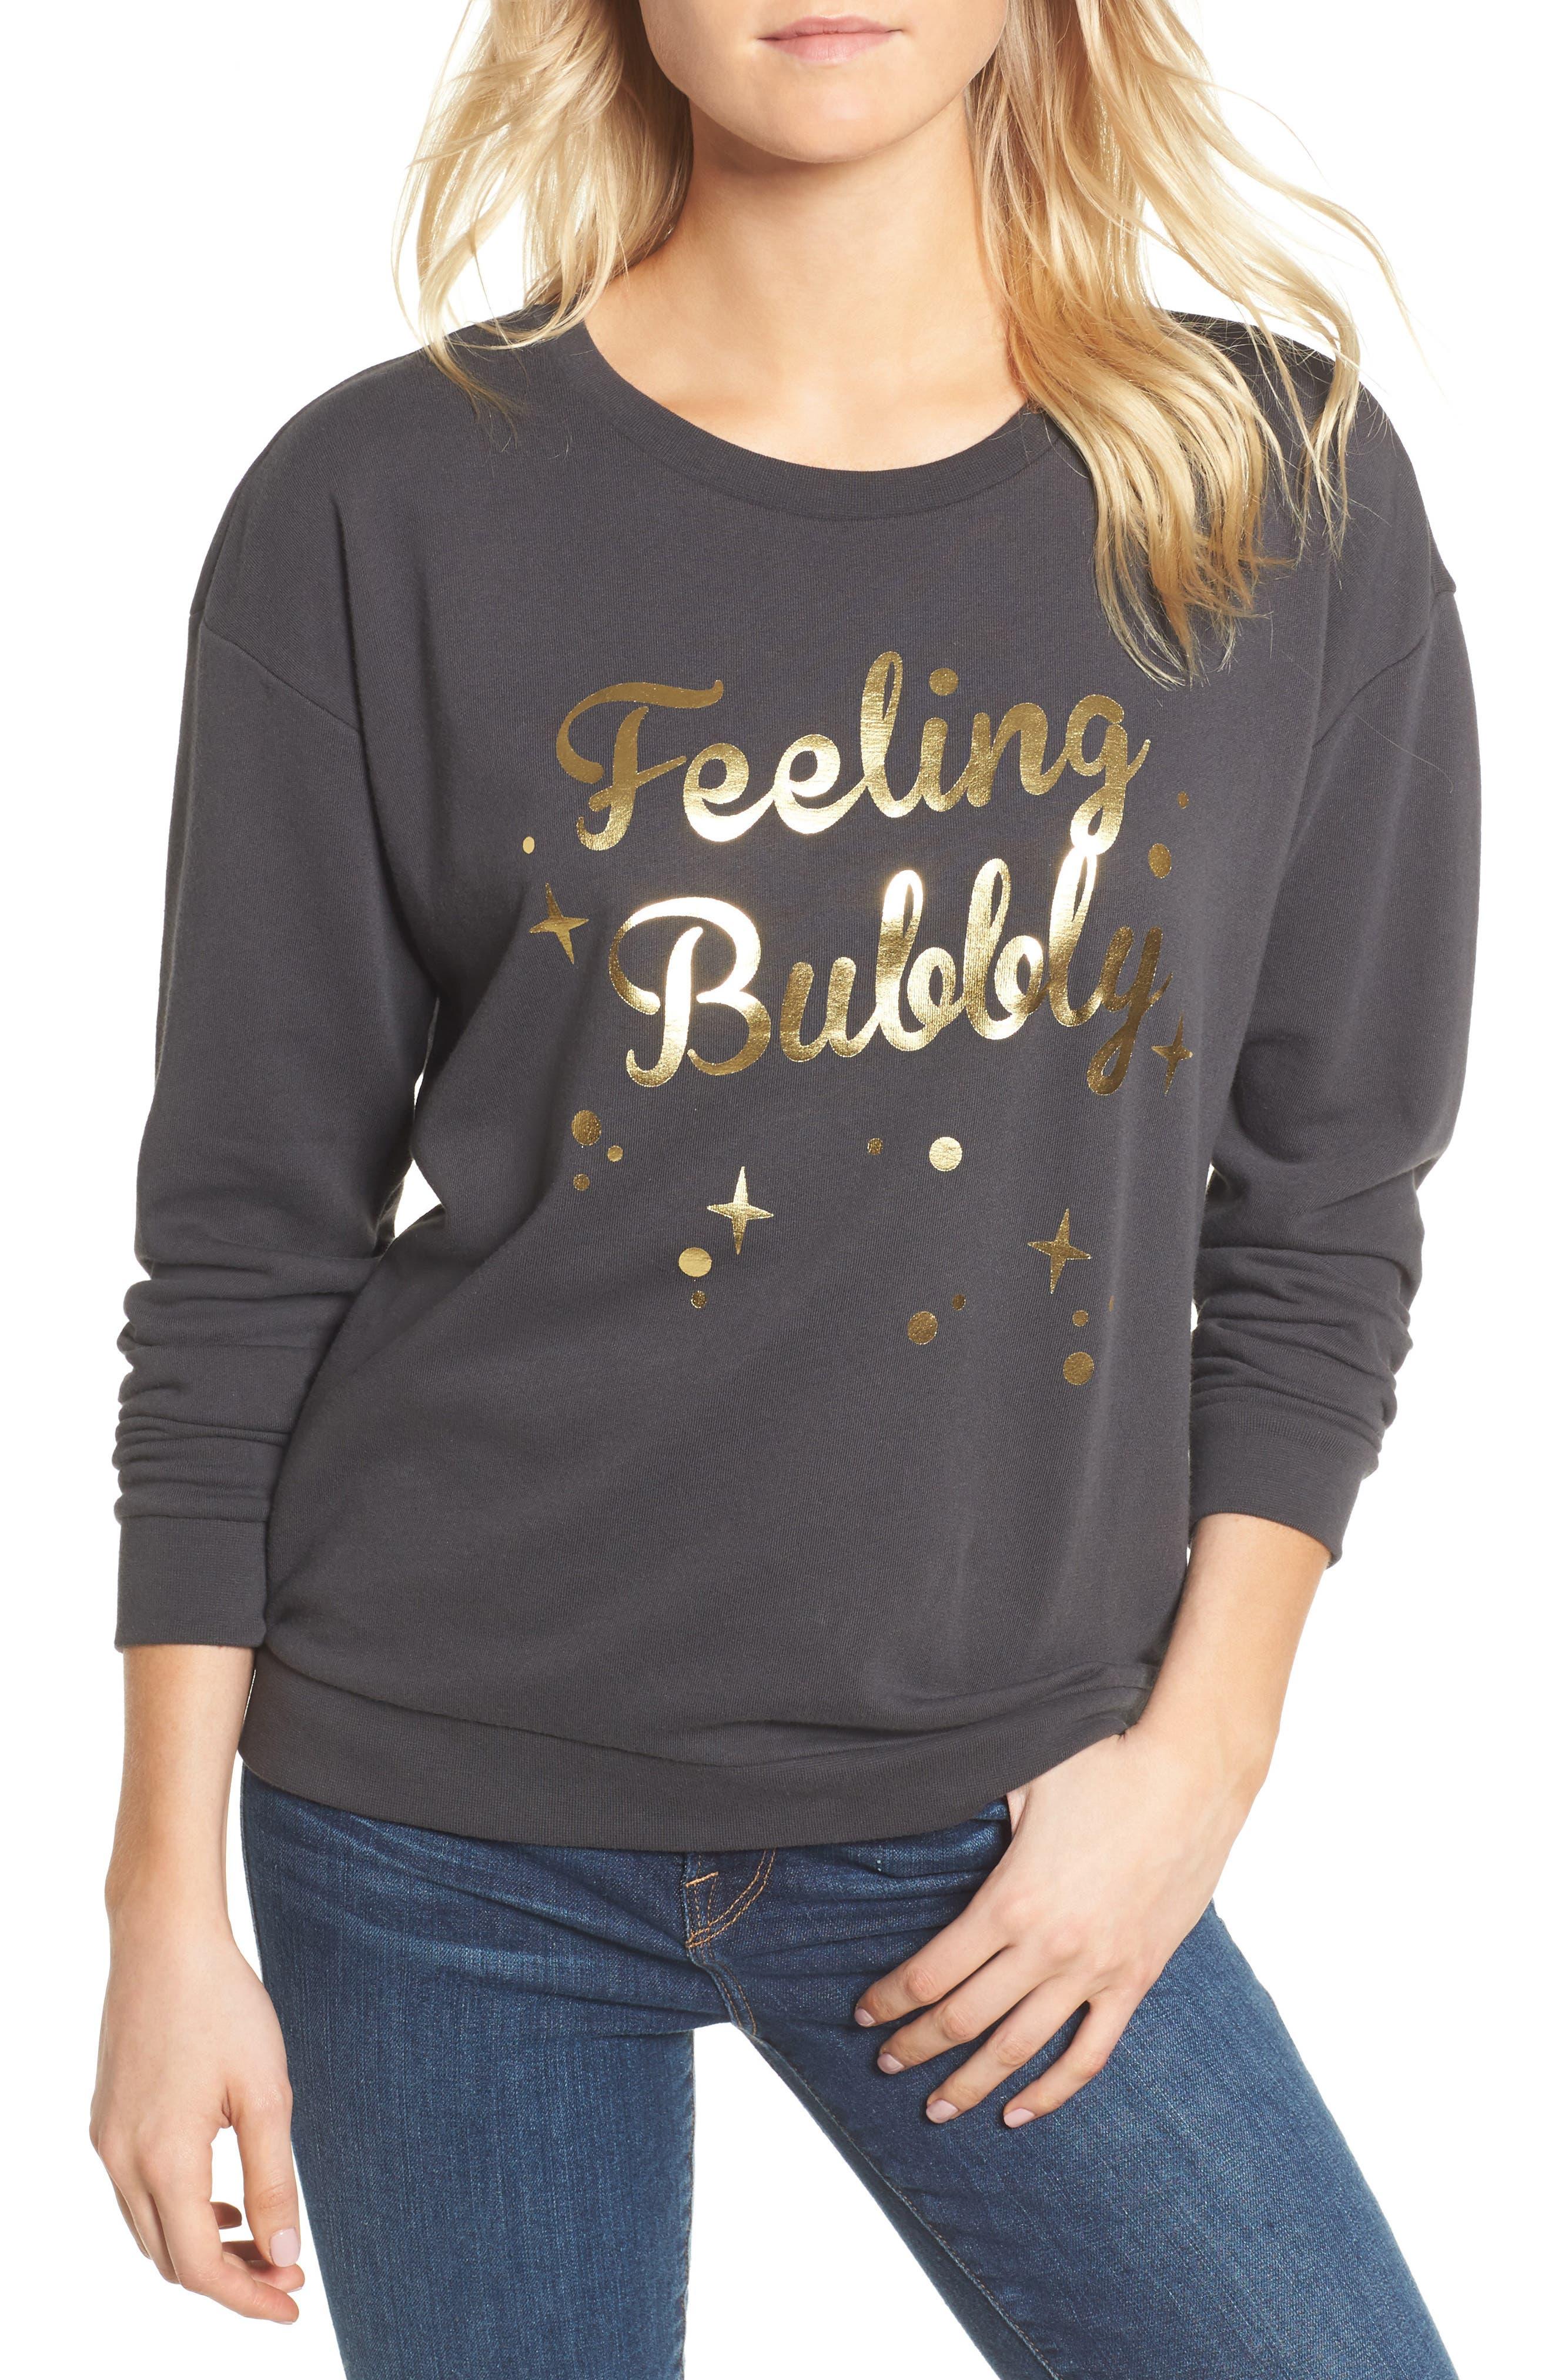 Main Image - South Parade Feeling Bubbly Sweatshirt